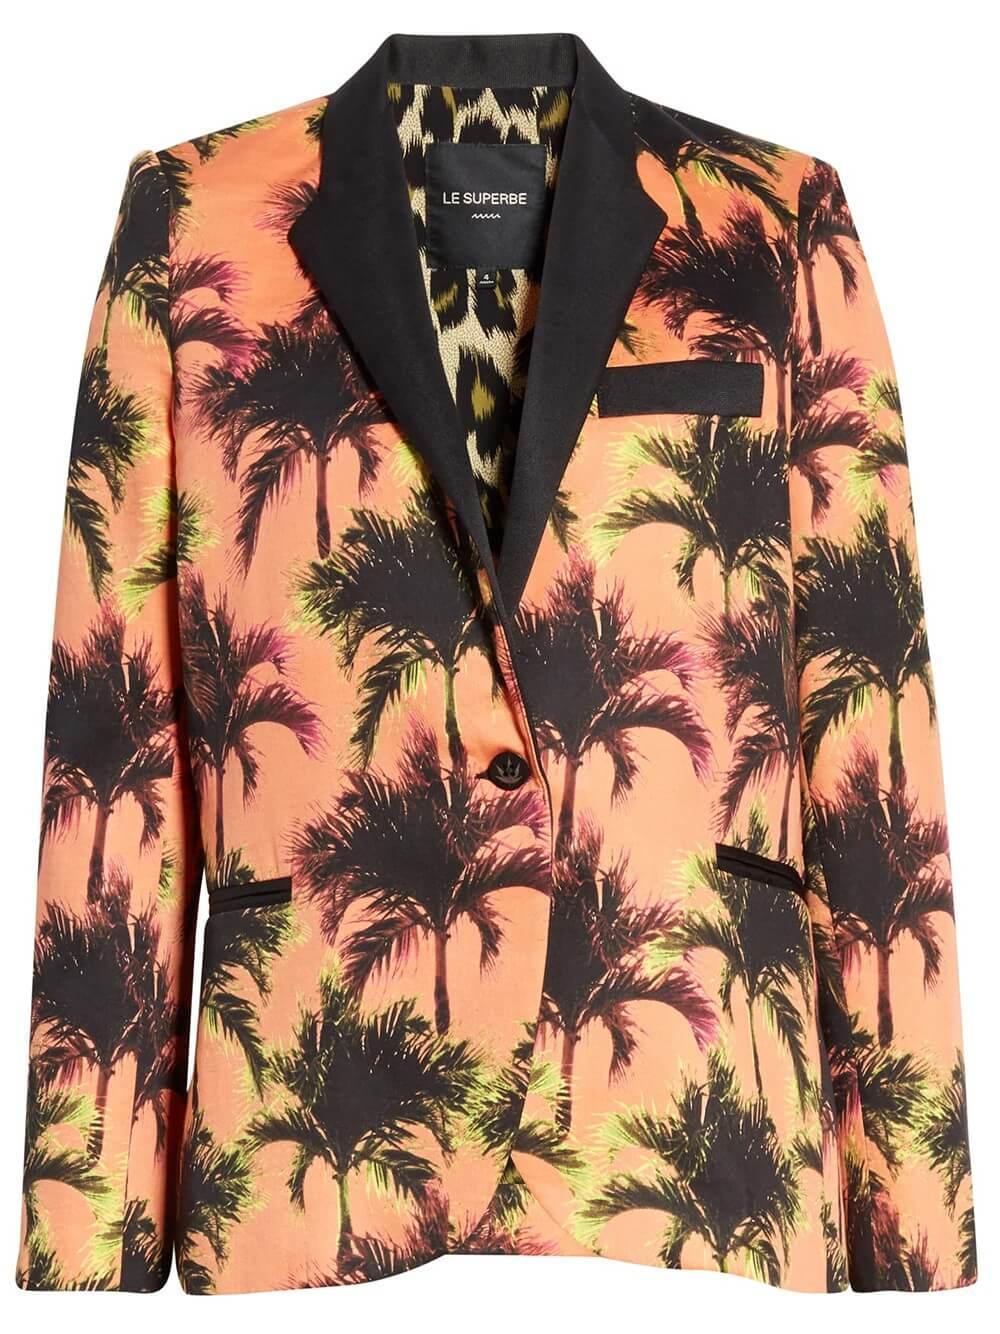 Coastal Palm Print Jacket Item # SP20-517EP